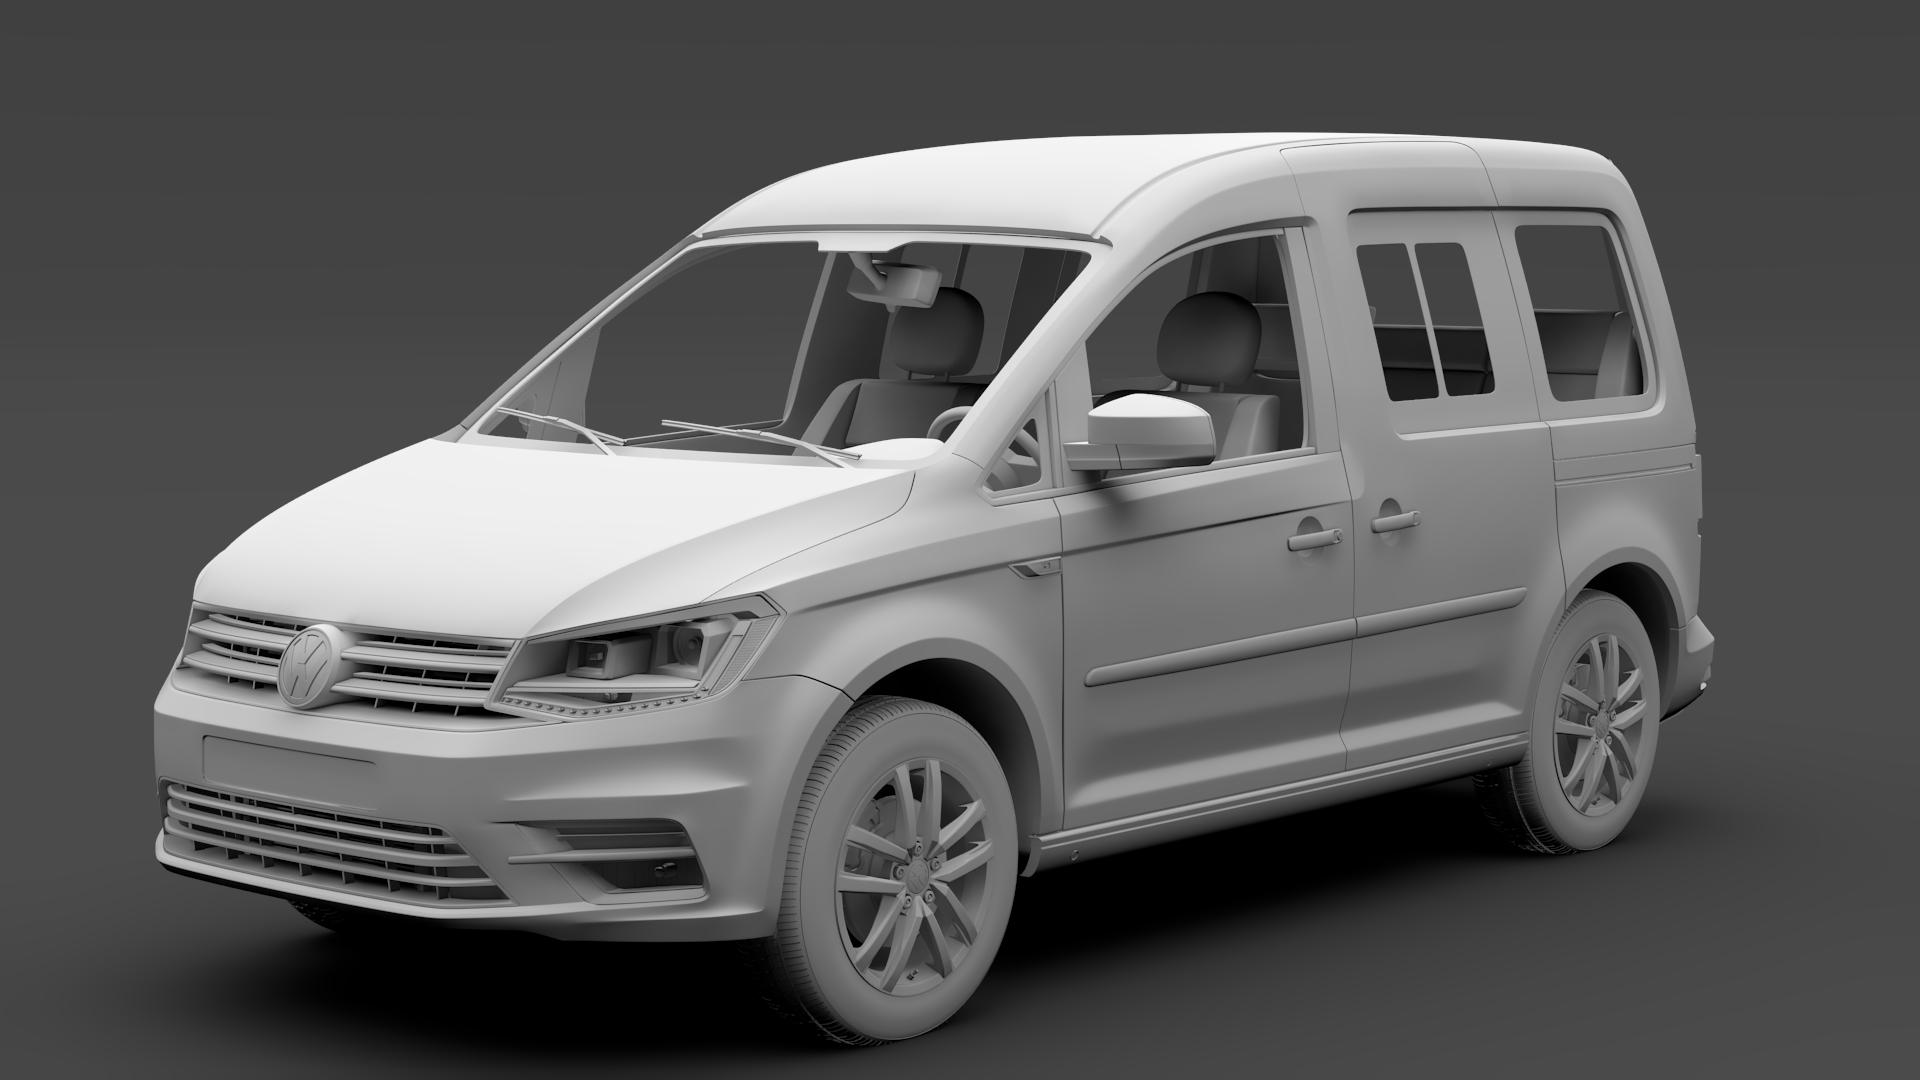 volkswagen caddy 2018 3d model max fbx c4d lwo ma mb hrc xsi obj 283809